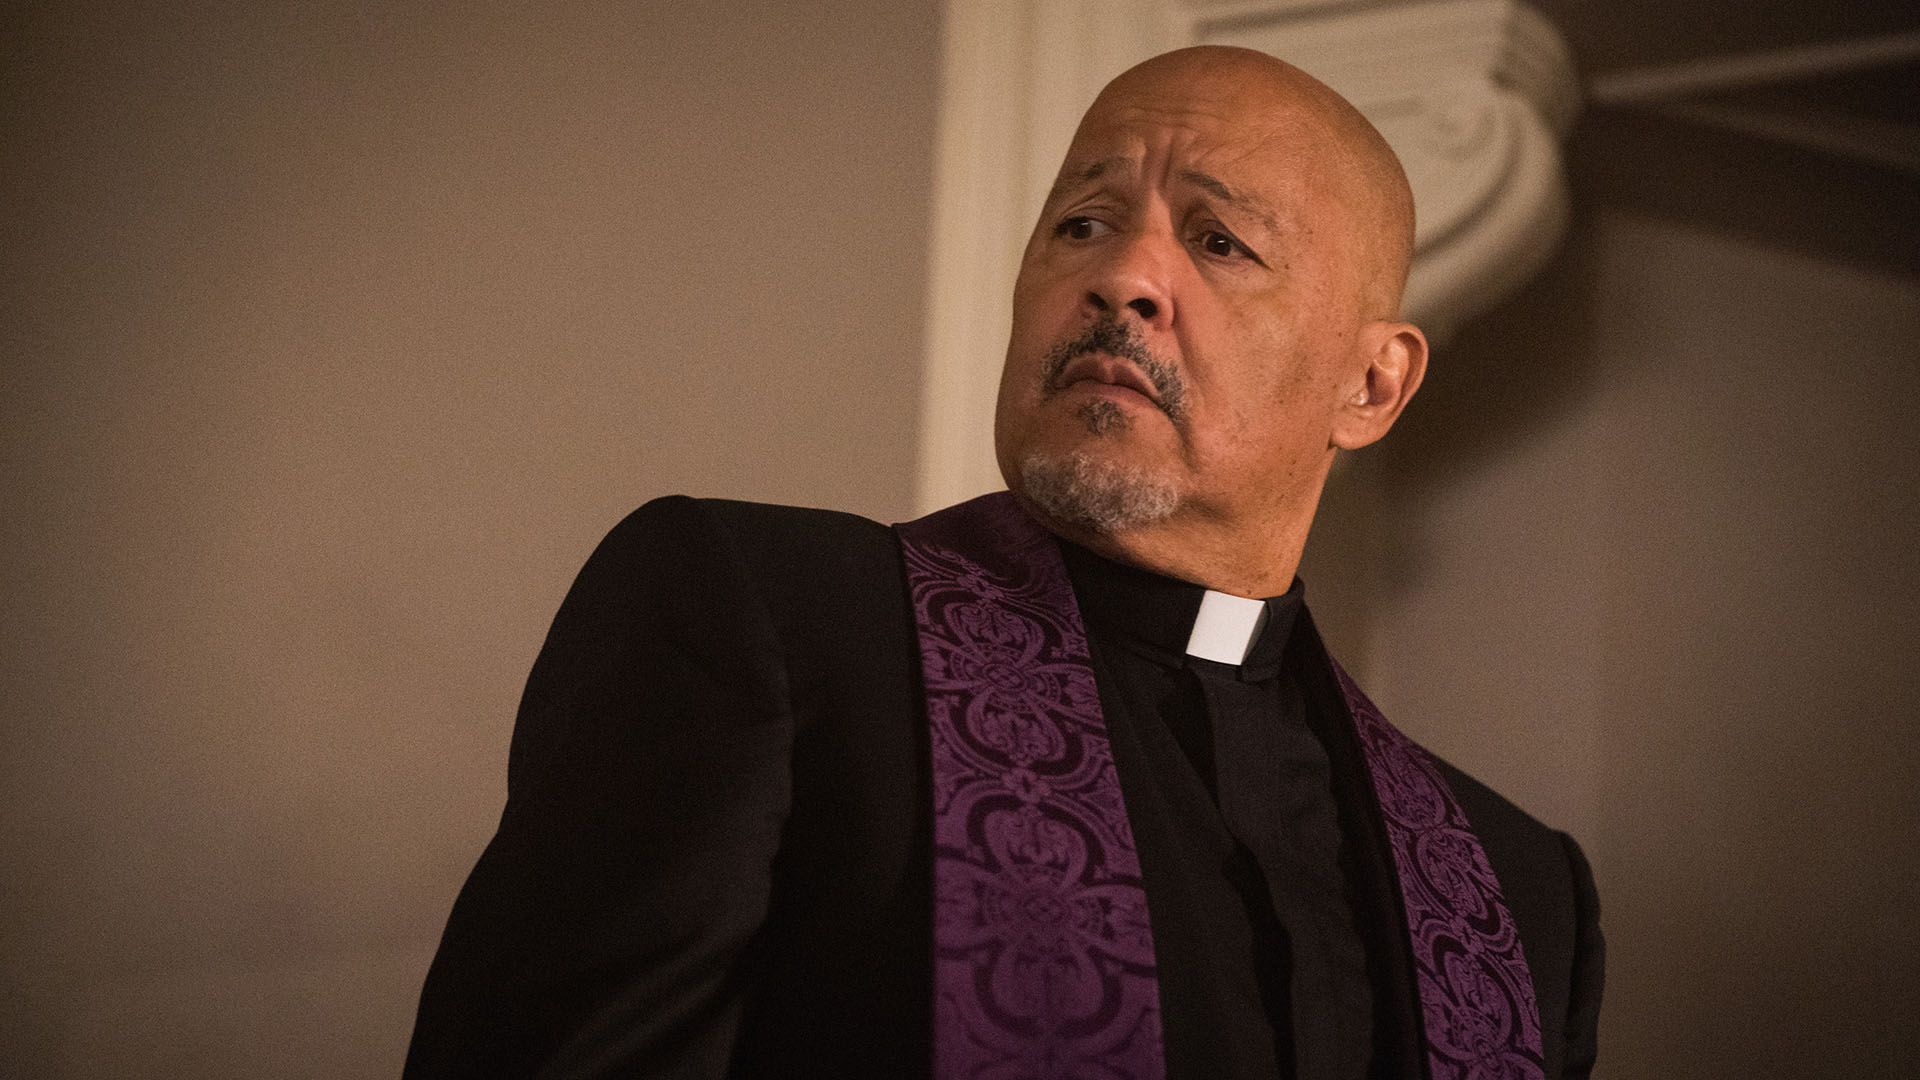 Clark Johnson as Father Amara